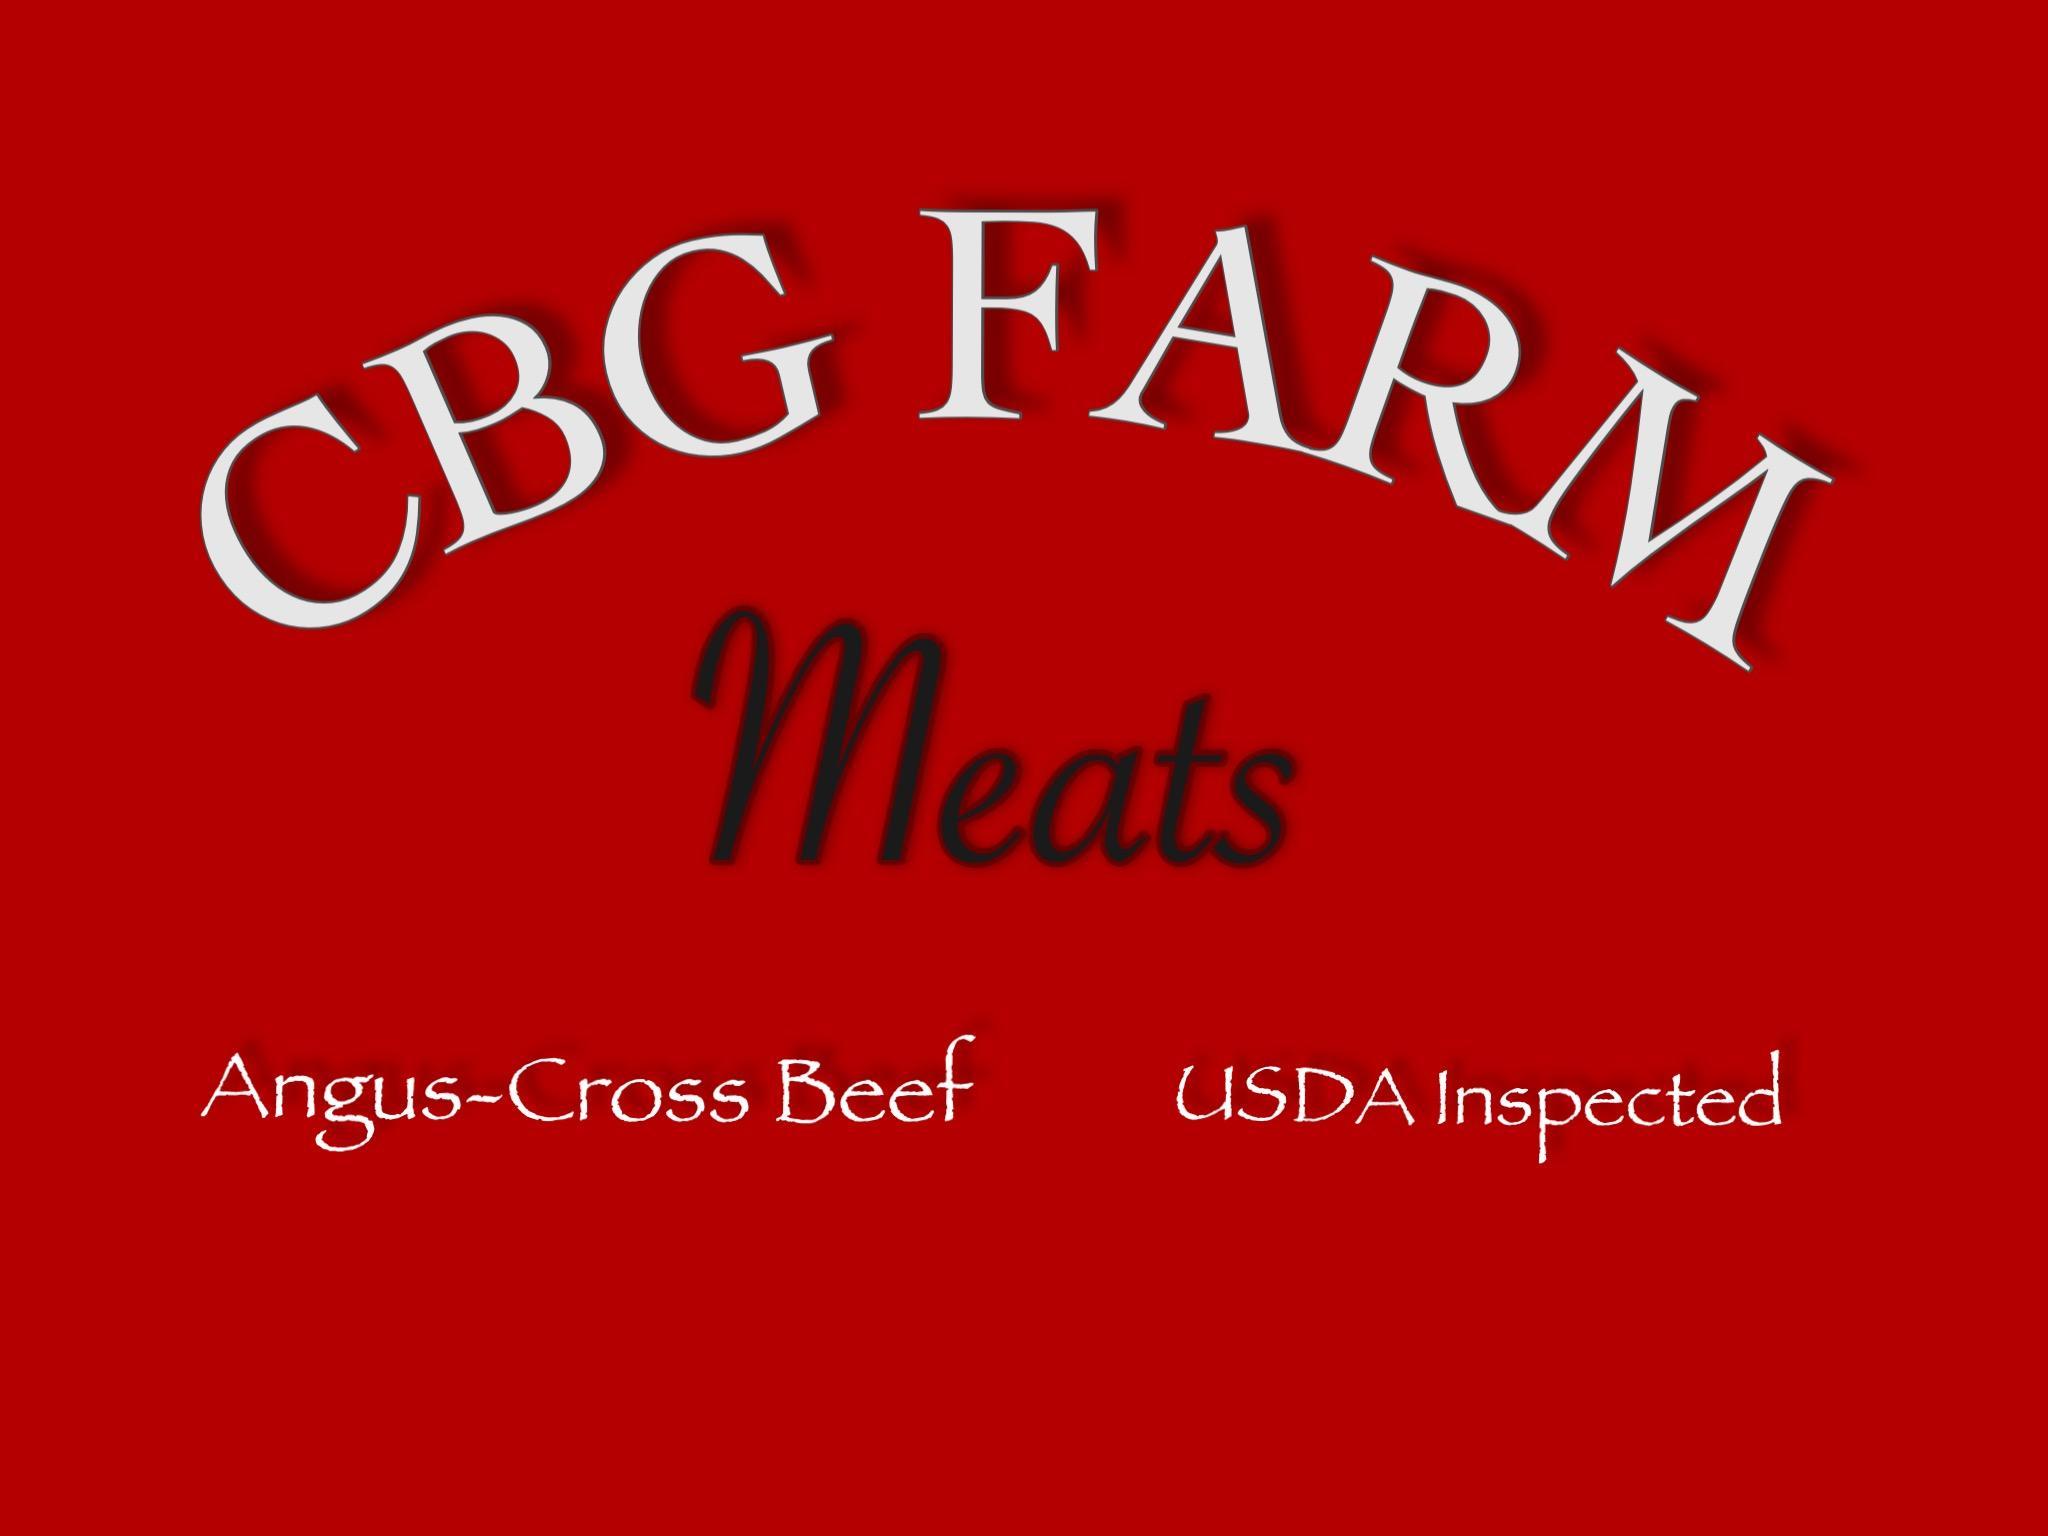 CBG Farm image 0